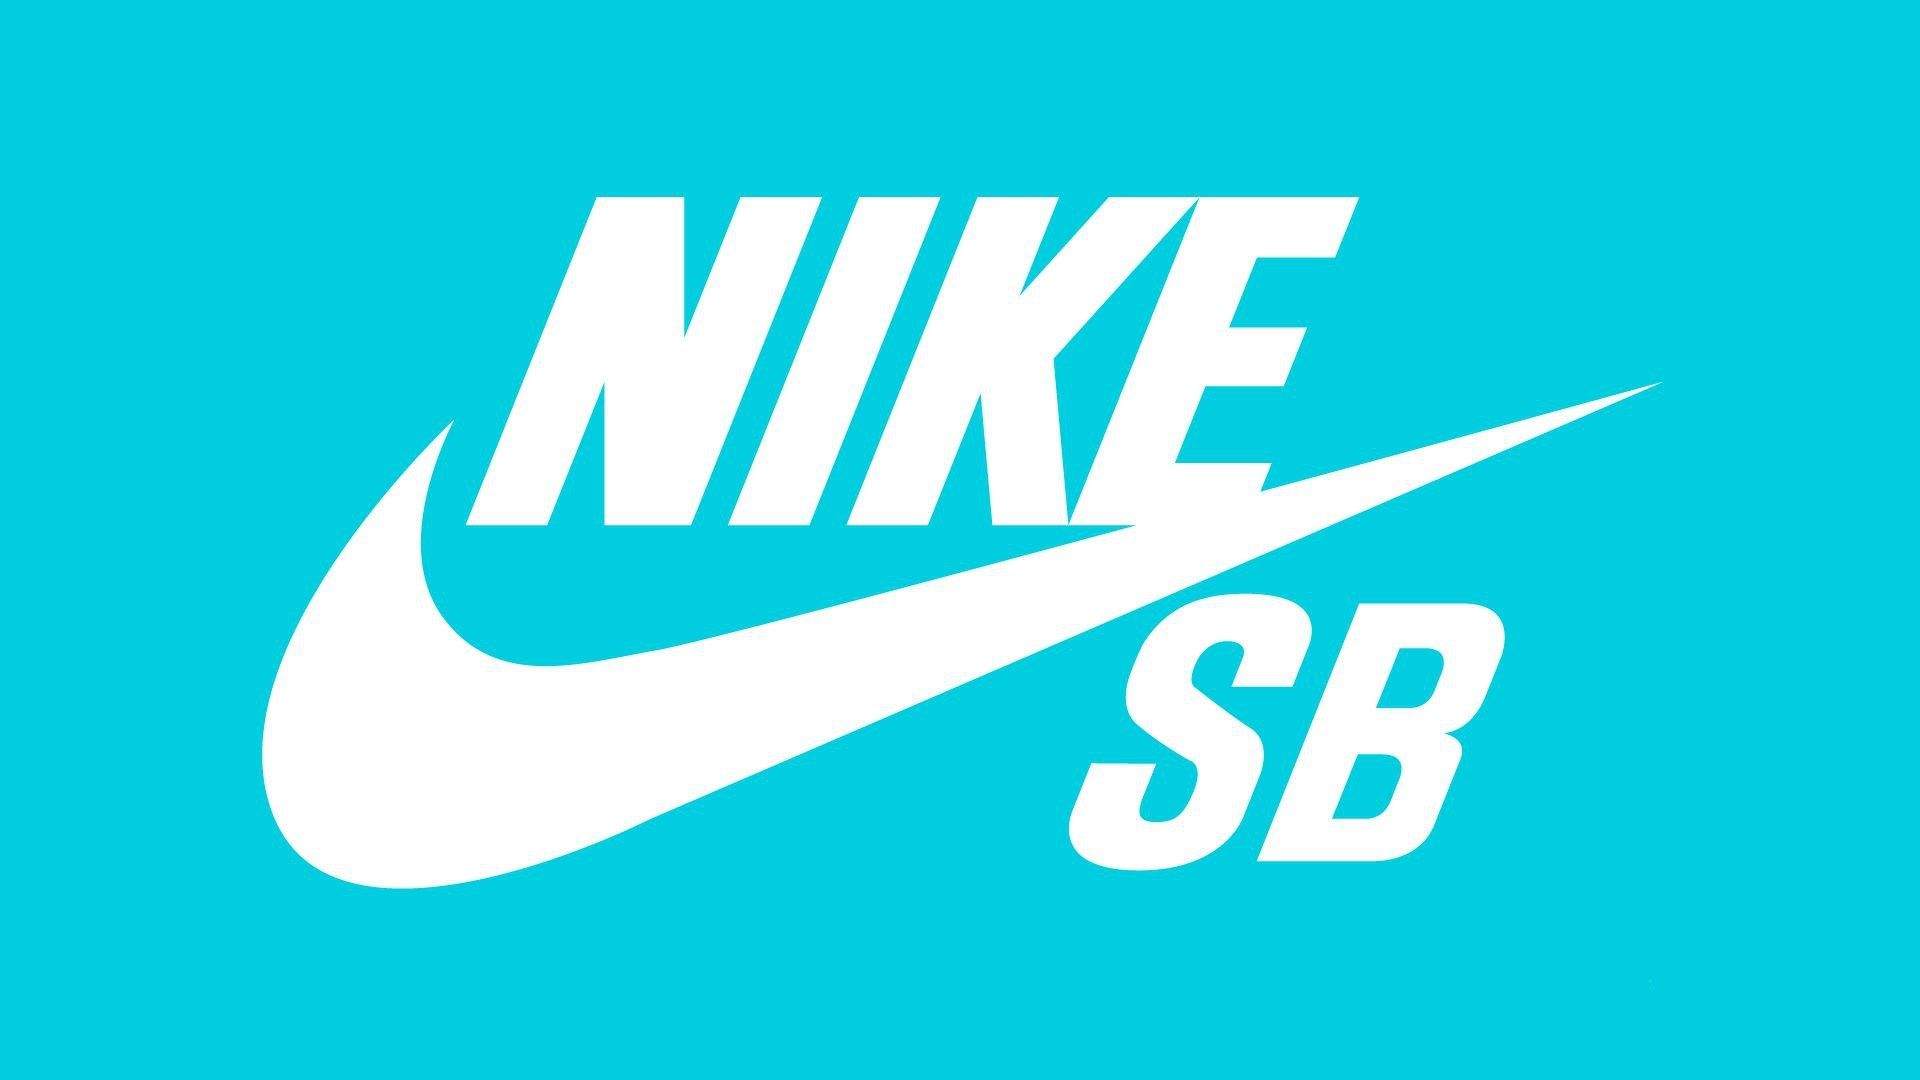 Nike Sb Logo Wallpapers Hd Nike Sb Logo Nike Sb Awesome nike sb logo wallpaper hd images